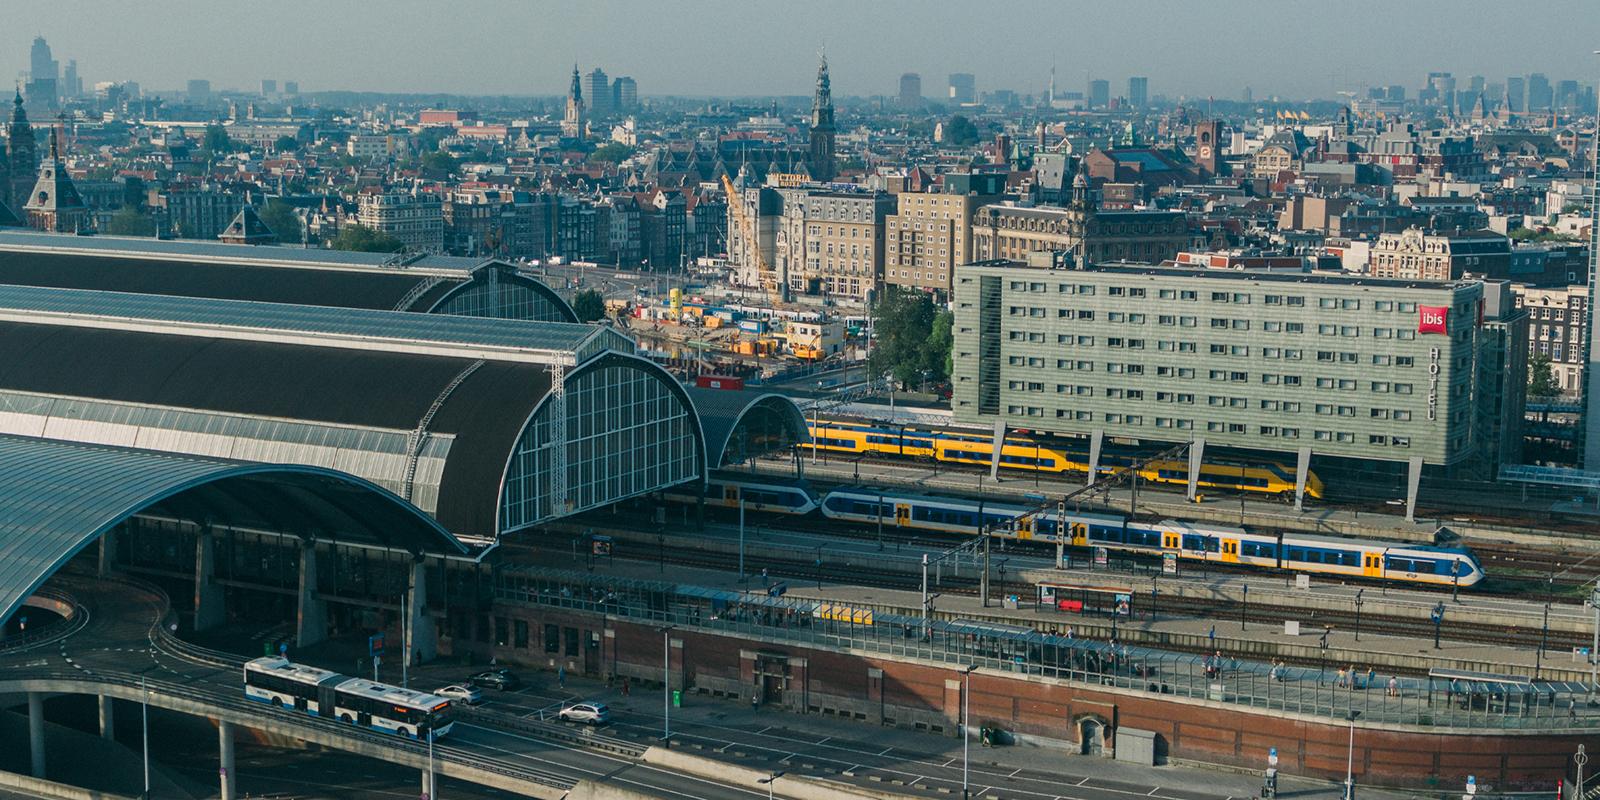 Amsterdam CS_1600x800.jpg